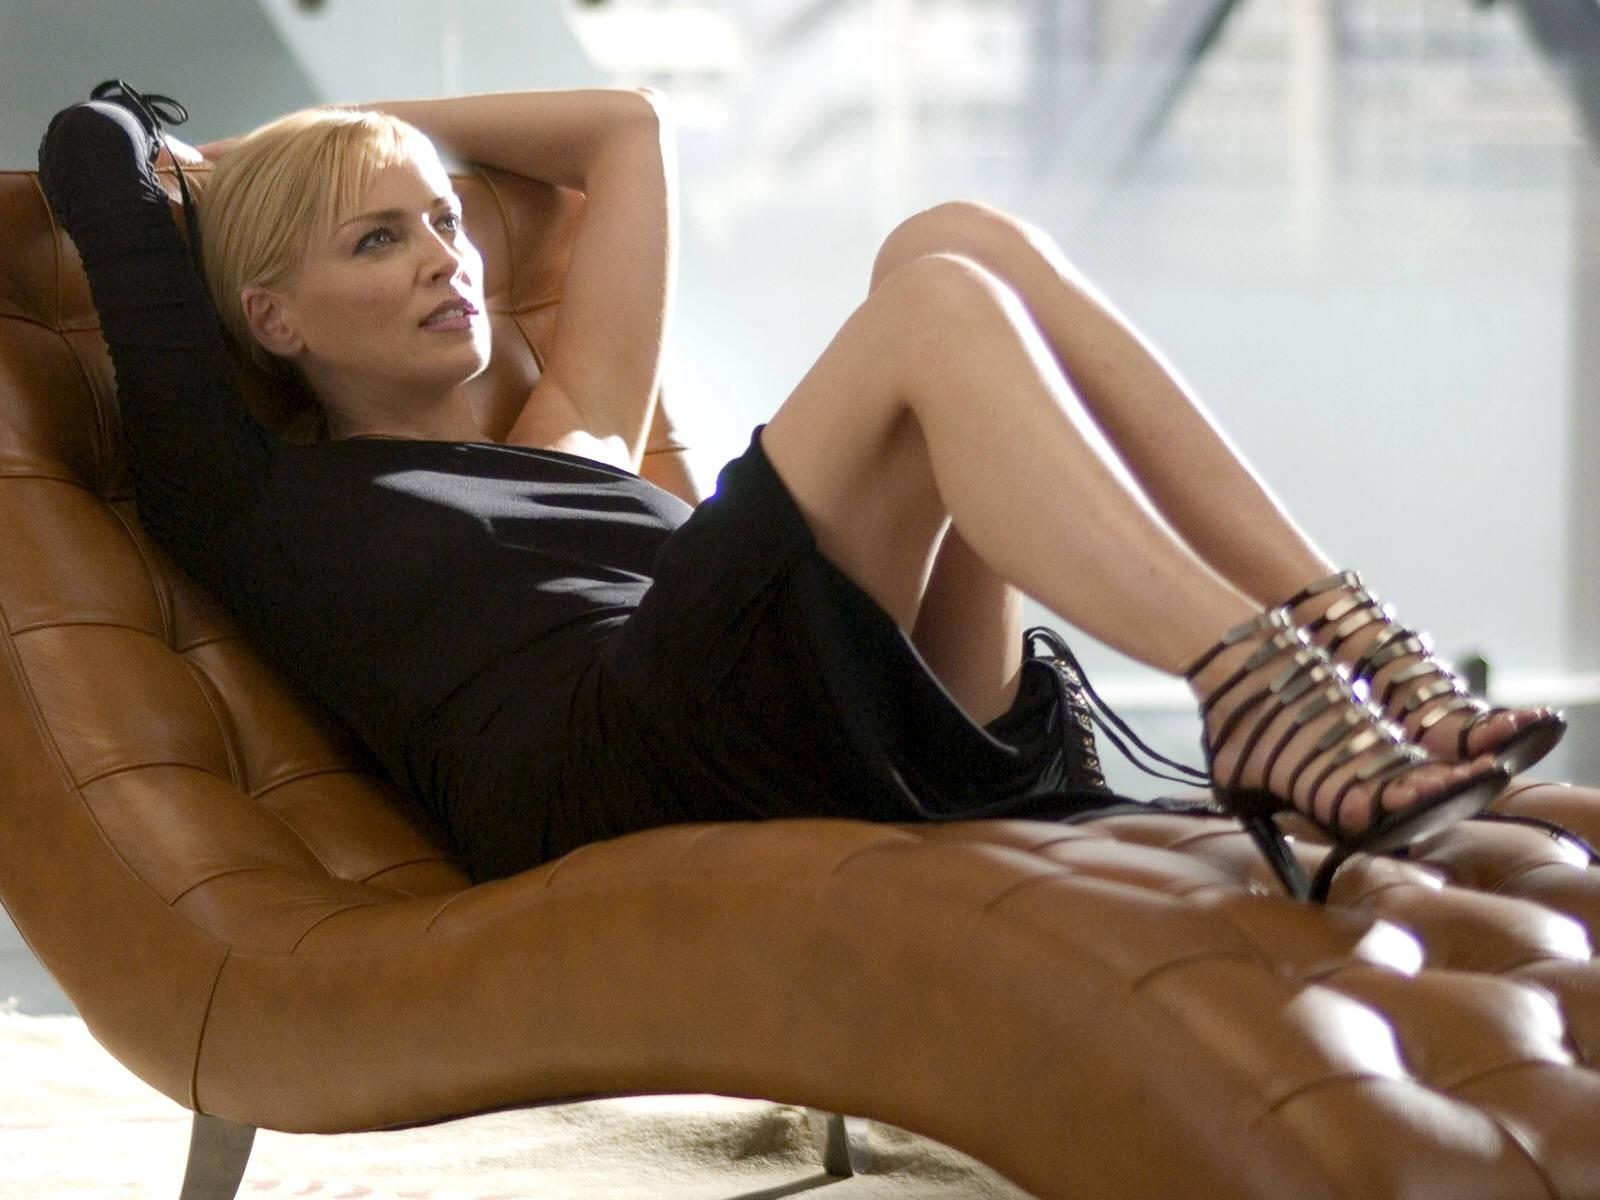 Wallpaper di Sharon Stone nel thriller erotico Basic Instinct 2